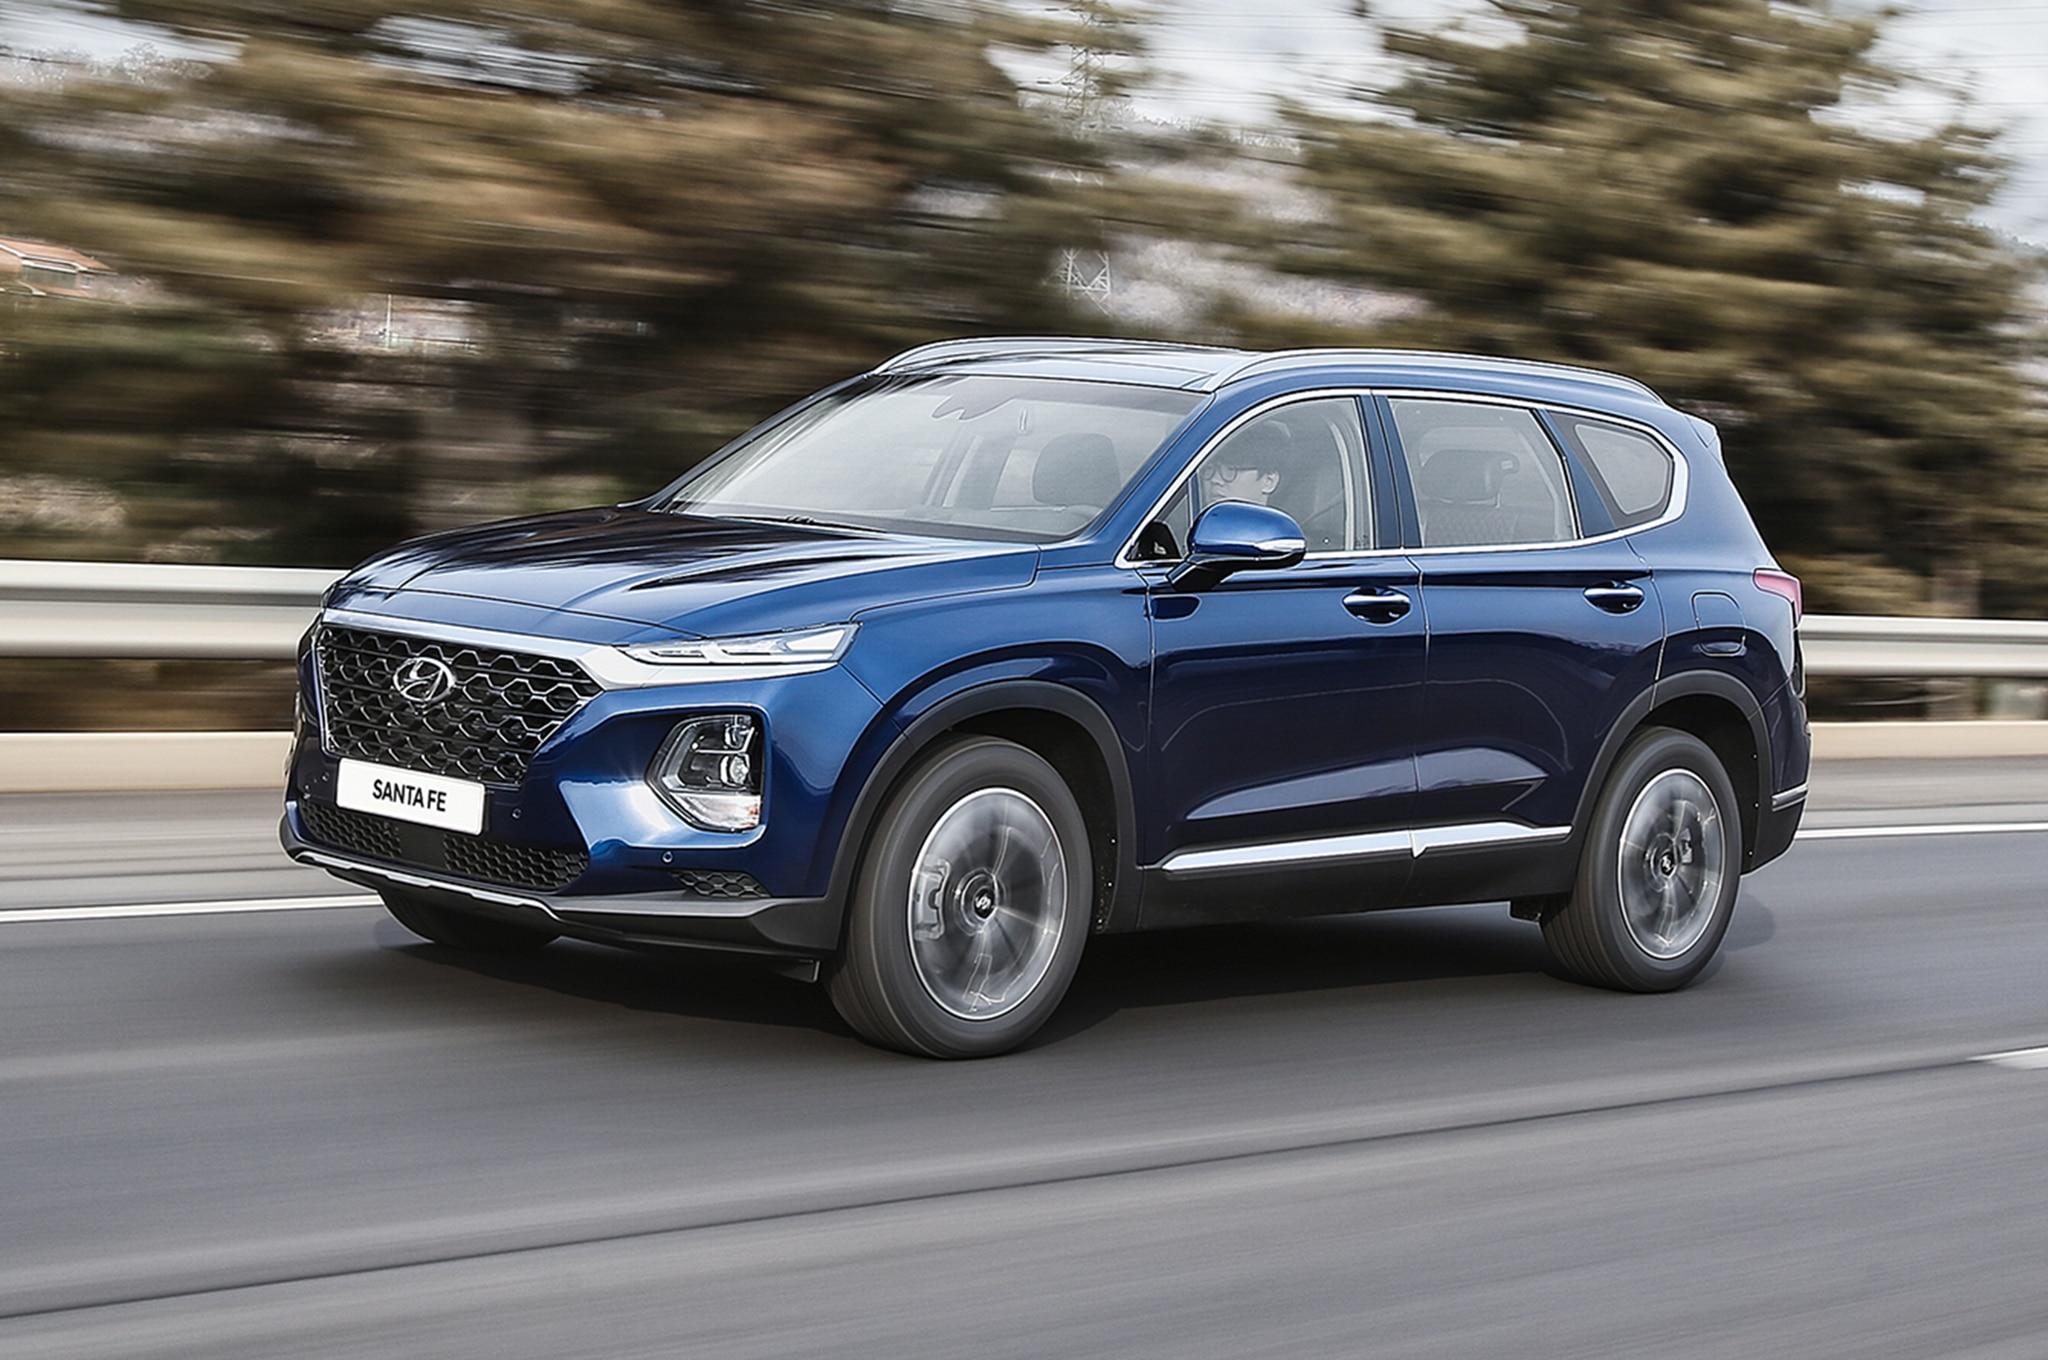 2019 Hyundai Santa Fe Korean Market Front Side In Motion 4